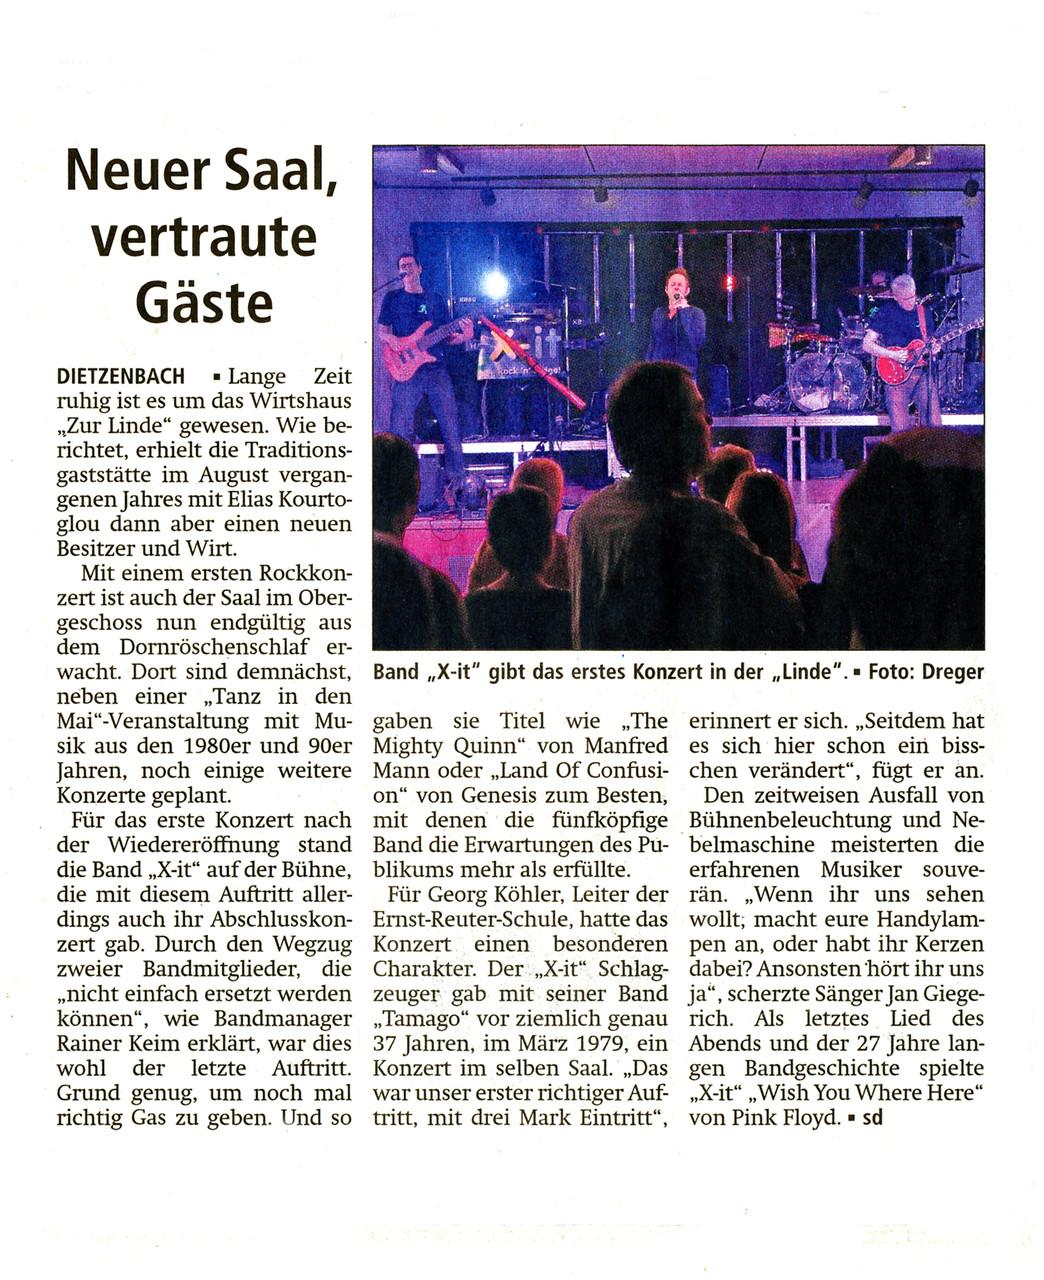 Offenbach Post, 22. März 2016